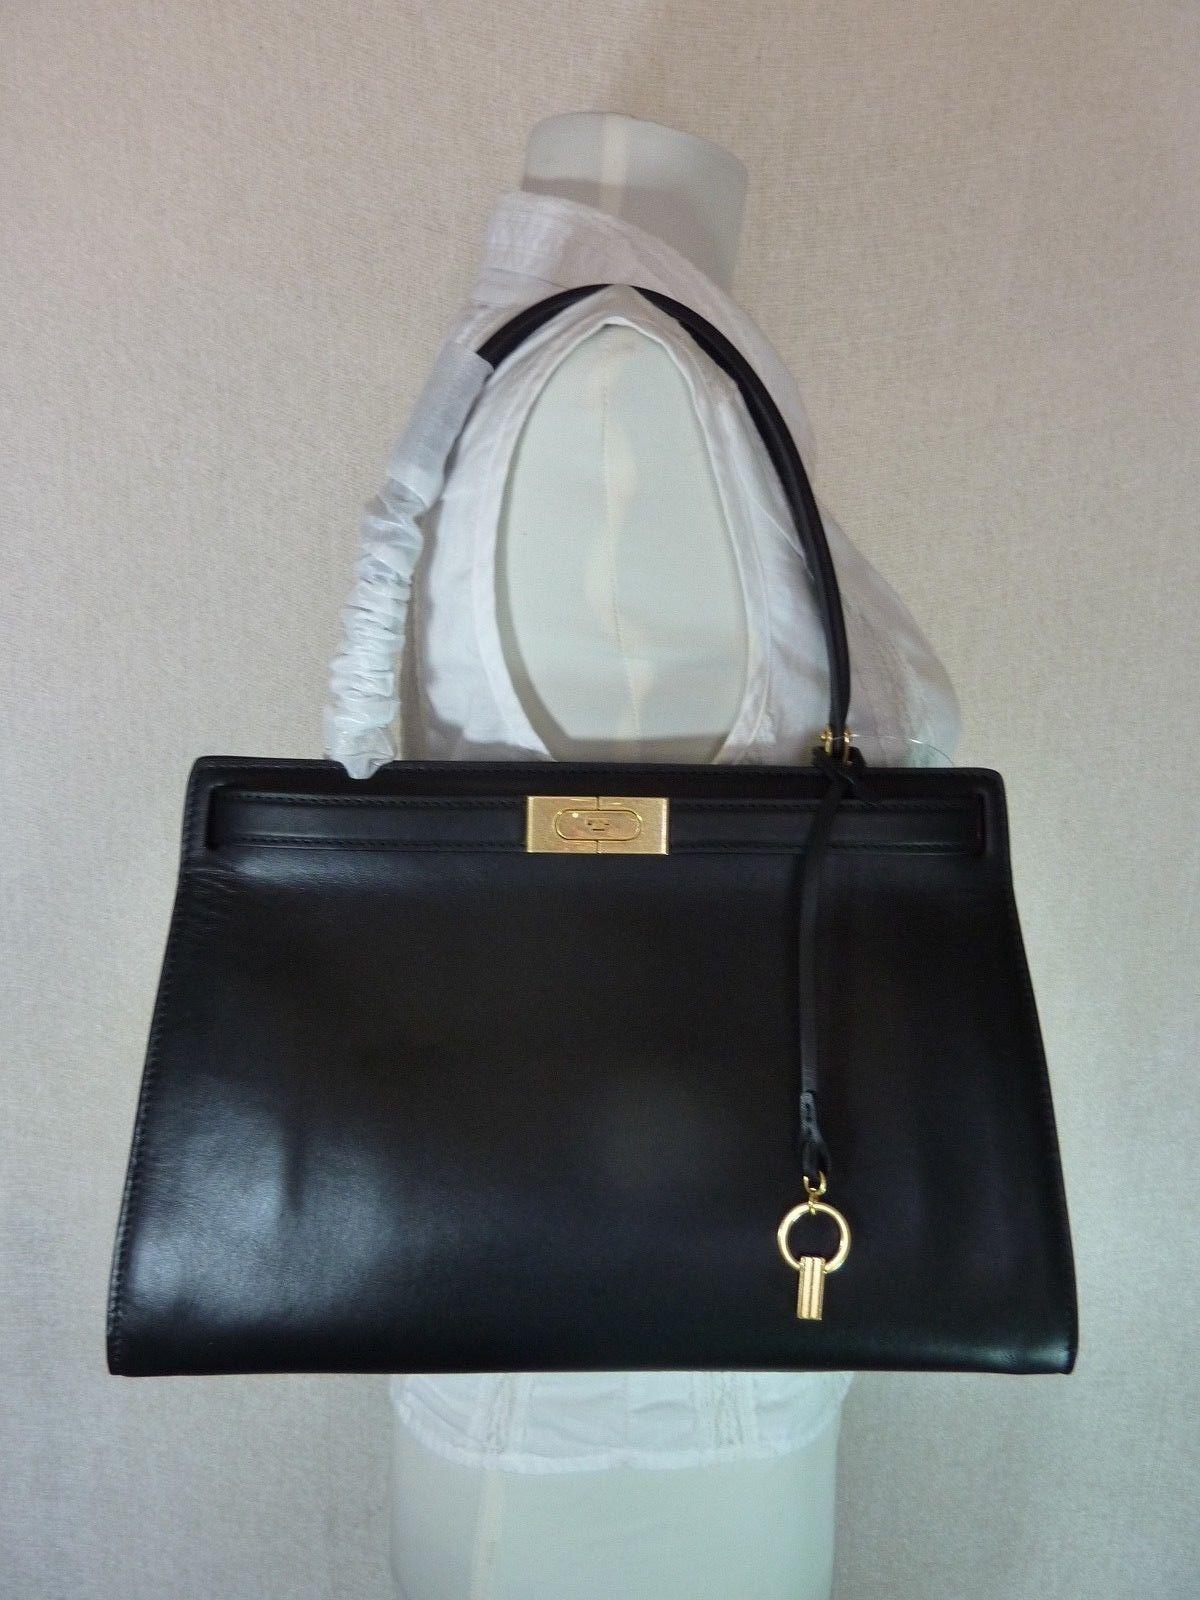 331627df66b4 Nwt Tory Burch Black Leather Lee Radziwill and 50 similar items. S l1600